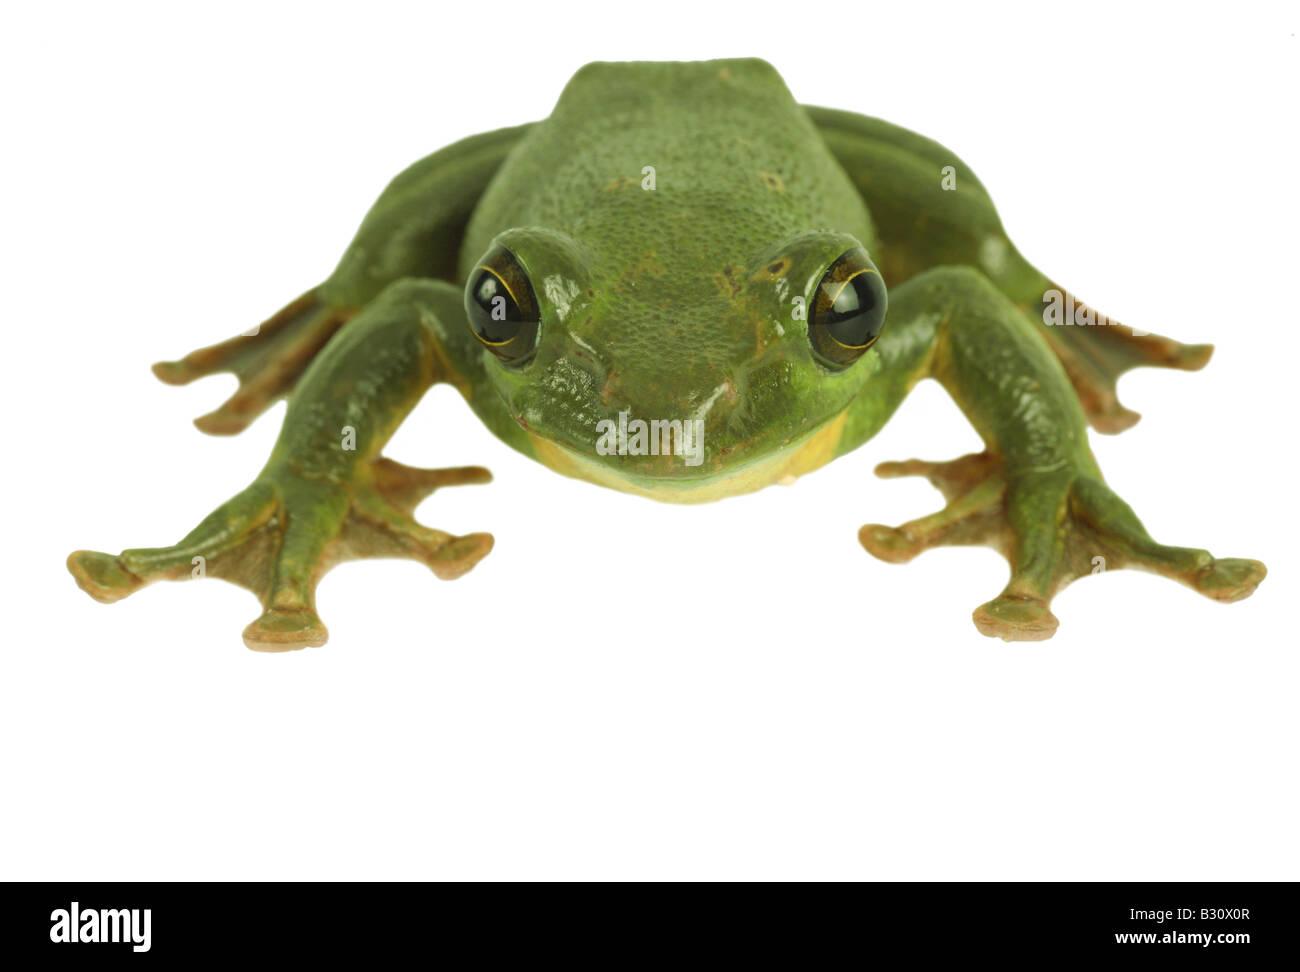 Rhacophorus dennysi, Blanford's whipping frog, asian gliding tree frog, asian gliding treefrog Stock Photo